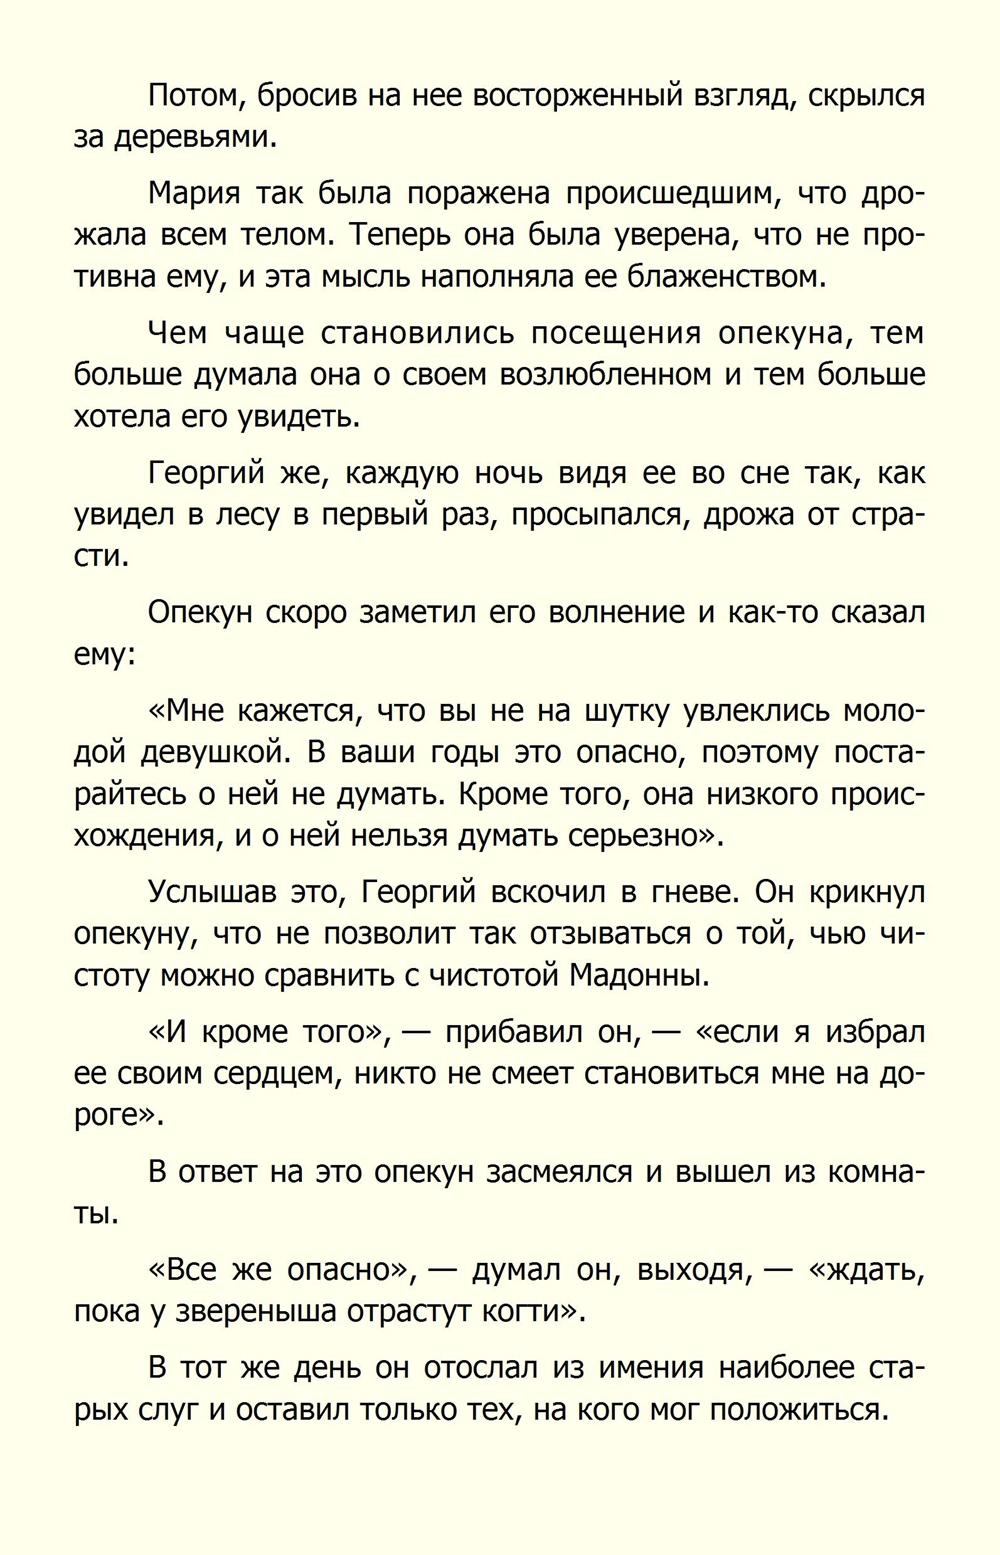 http://ipic.su/img/img7/fs/Korvin-Piotrovskij.1584704303.jpg